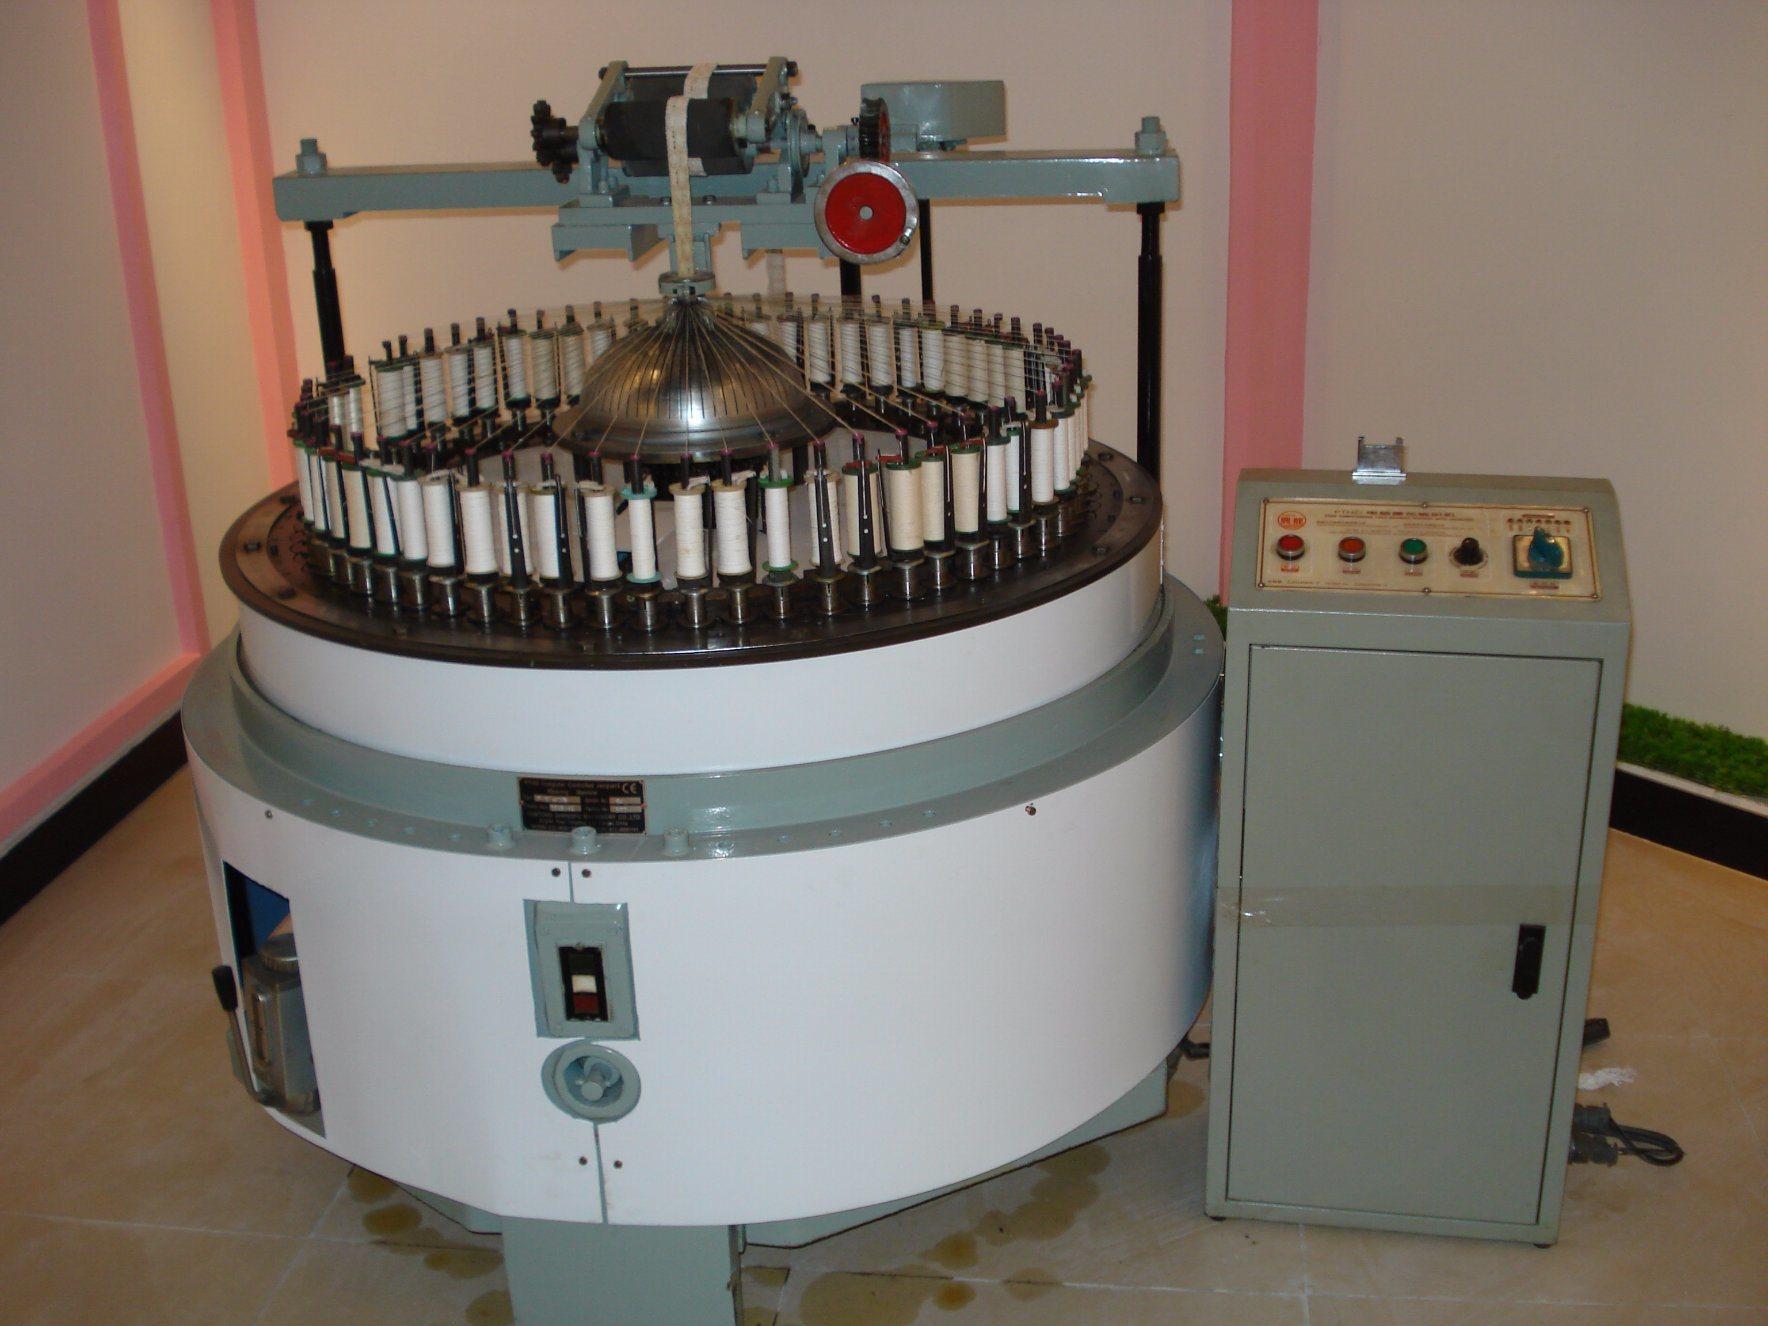 Pthd-64 Computerized Lace Braiding Machine